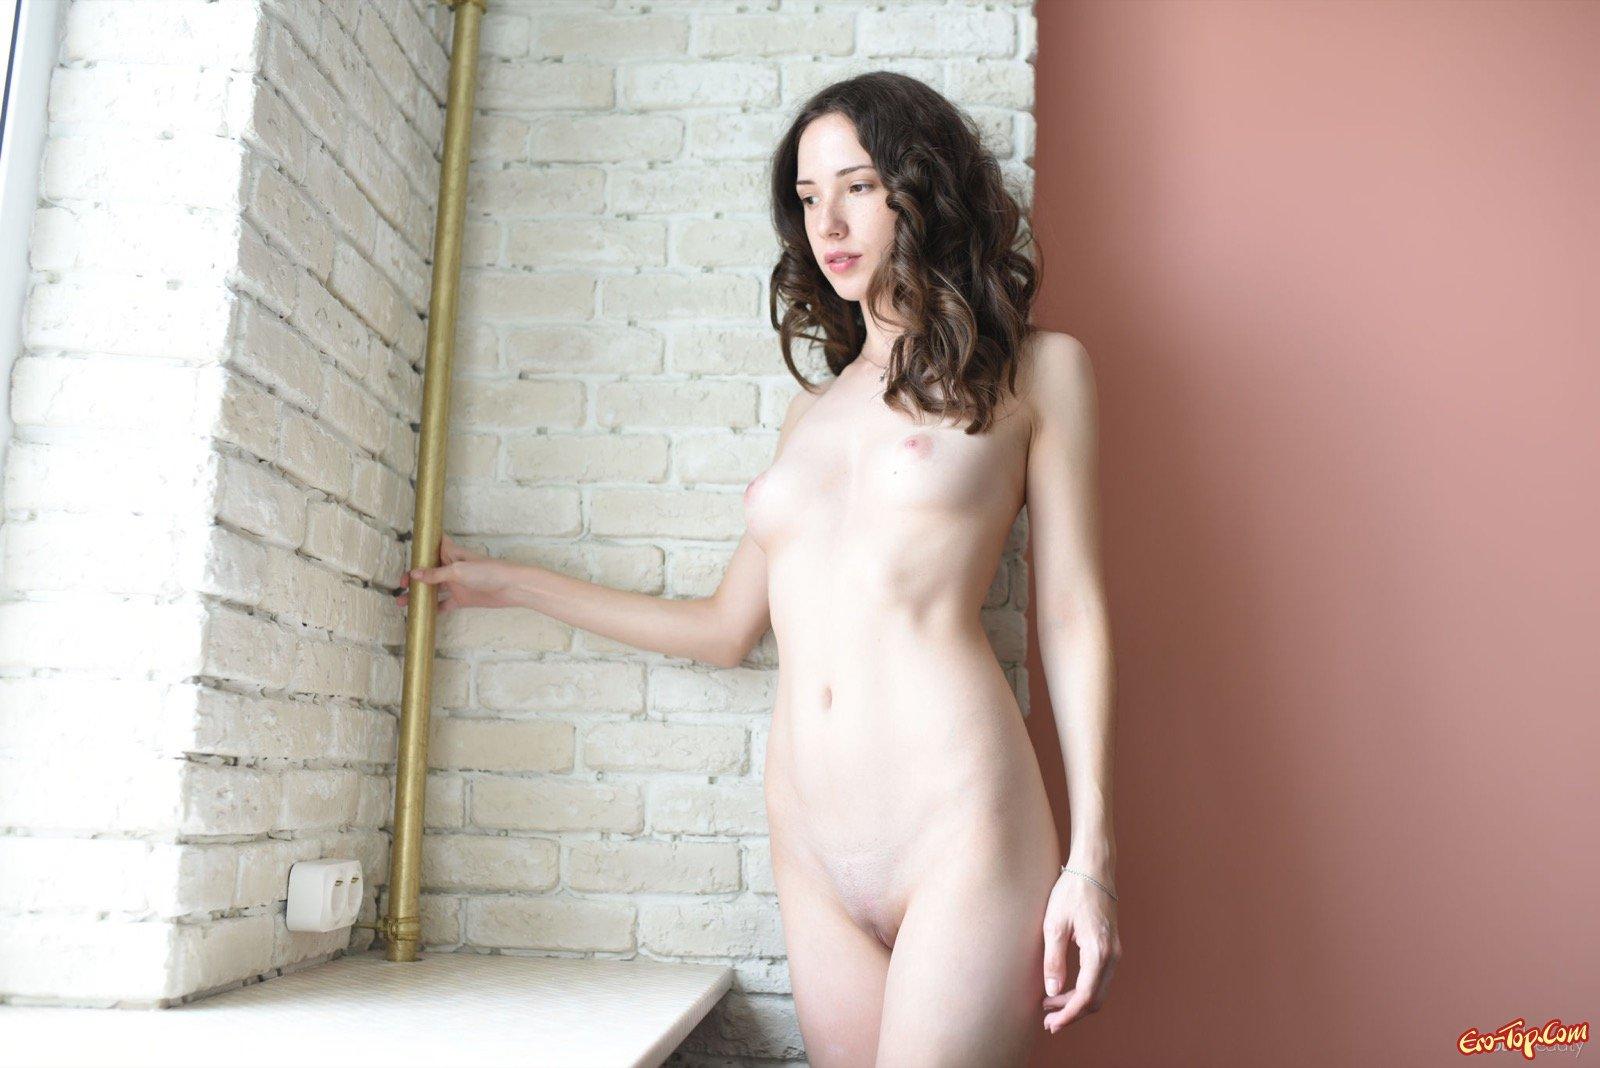 Молодая красавица разделась перед камерой